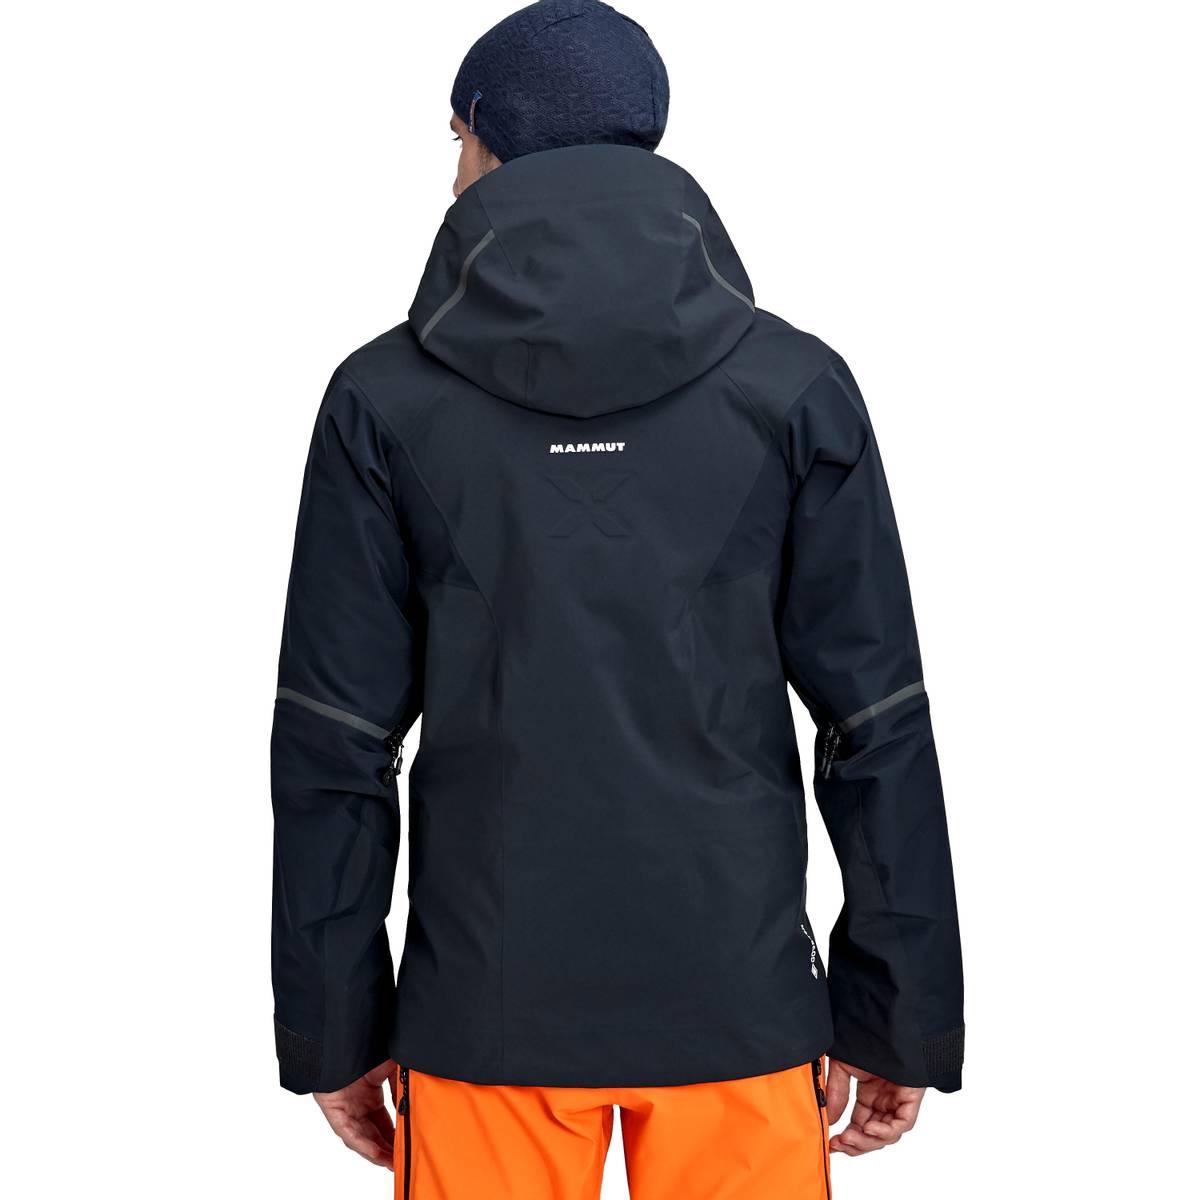 Mammut Nordwand Pro Hooded Hooded Hardshell Jacket Men Night